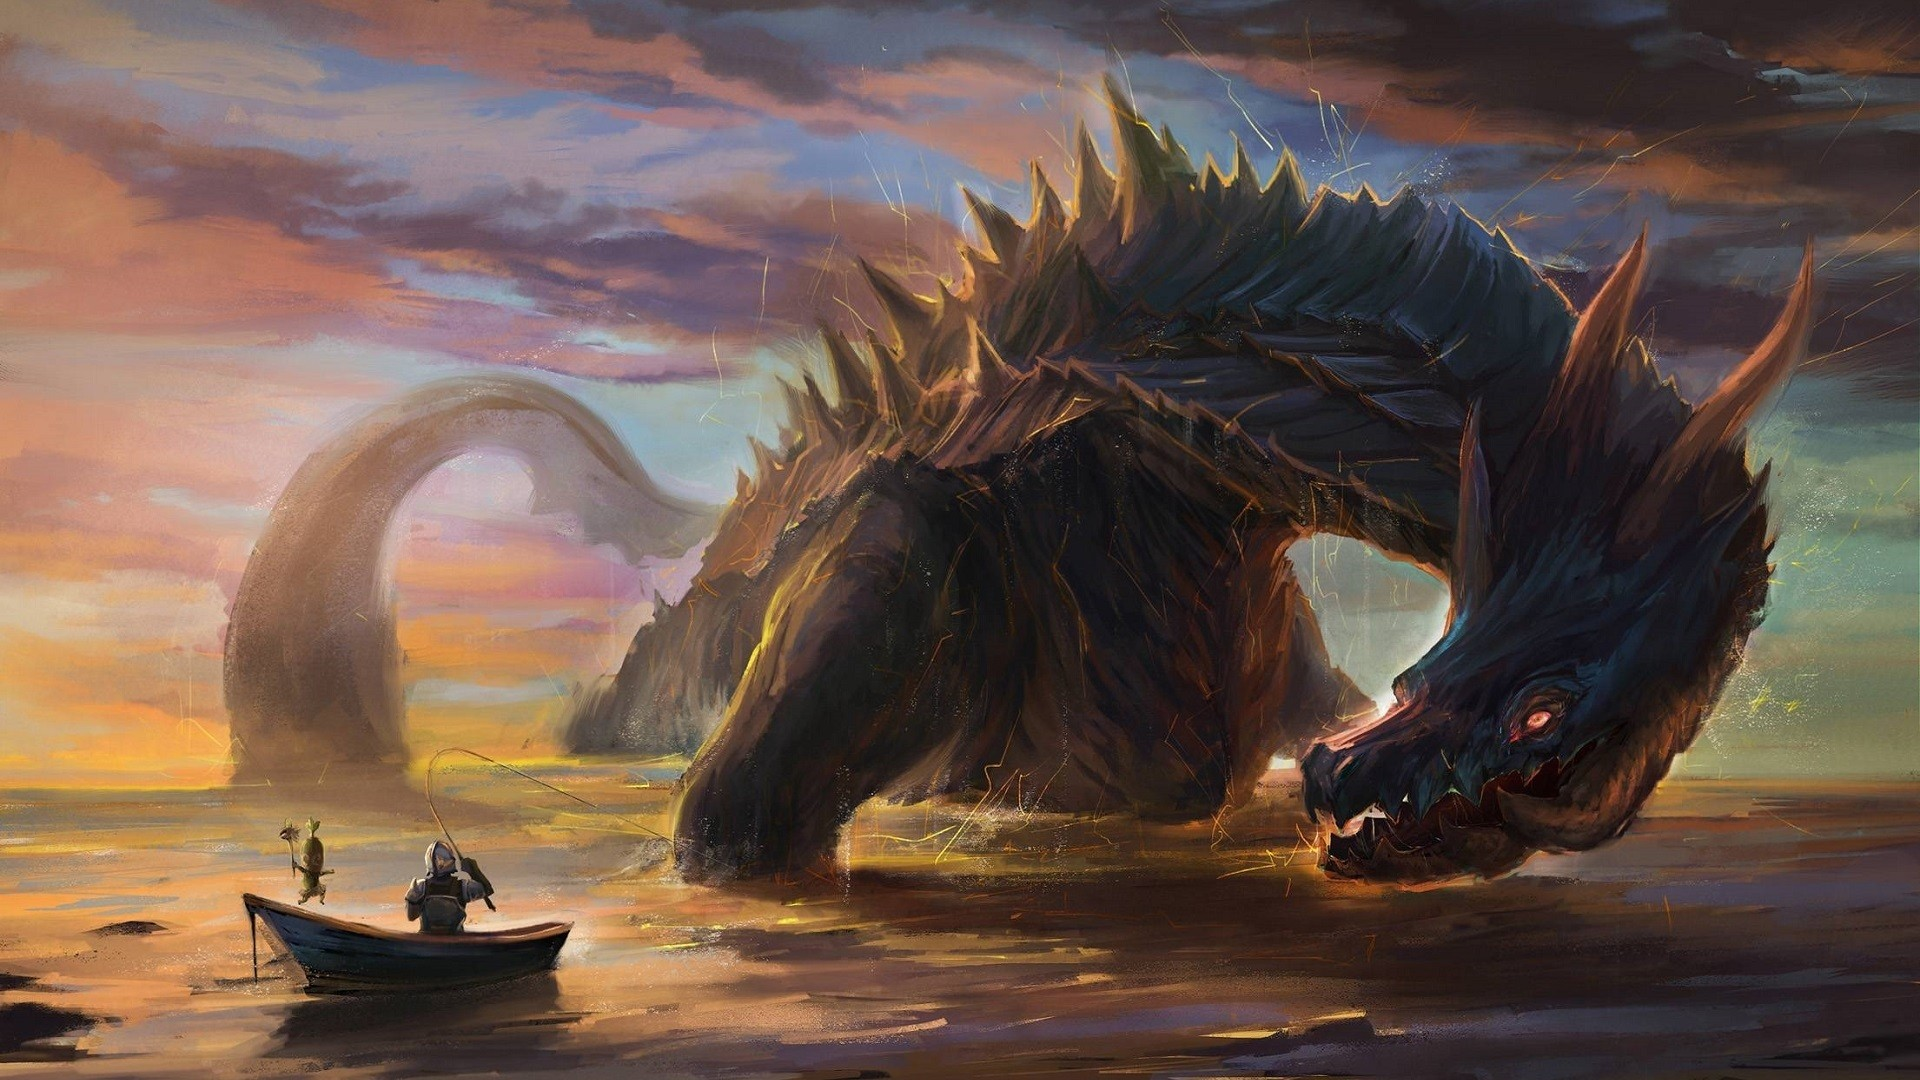 Top 50 HD Dragon Wallpapers, Images, Backgrounds, Desktop .